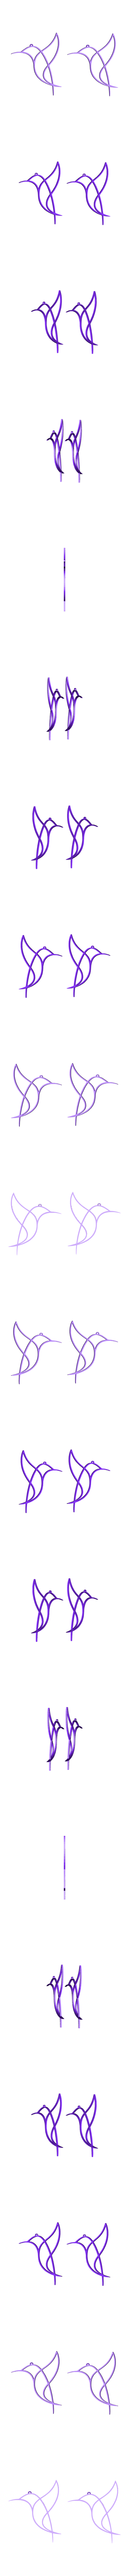 2_pendents_bird.stl Download free STL file Pendientes Pajaro • 3D printer object, 3dlito